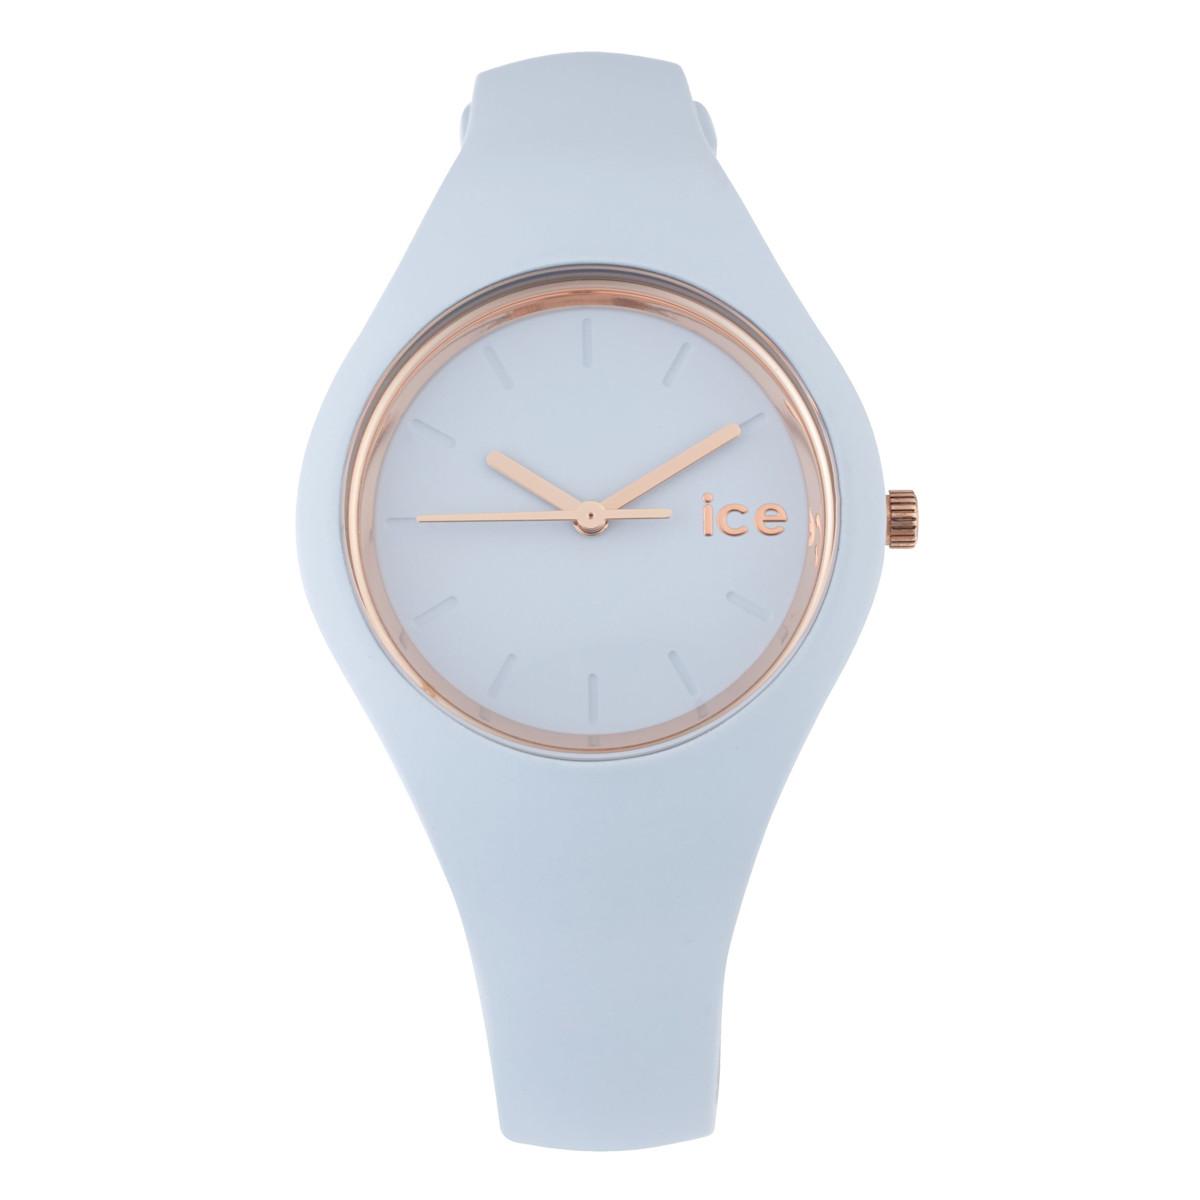 armbanduhr-pastell-extraflach-modern